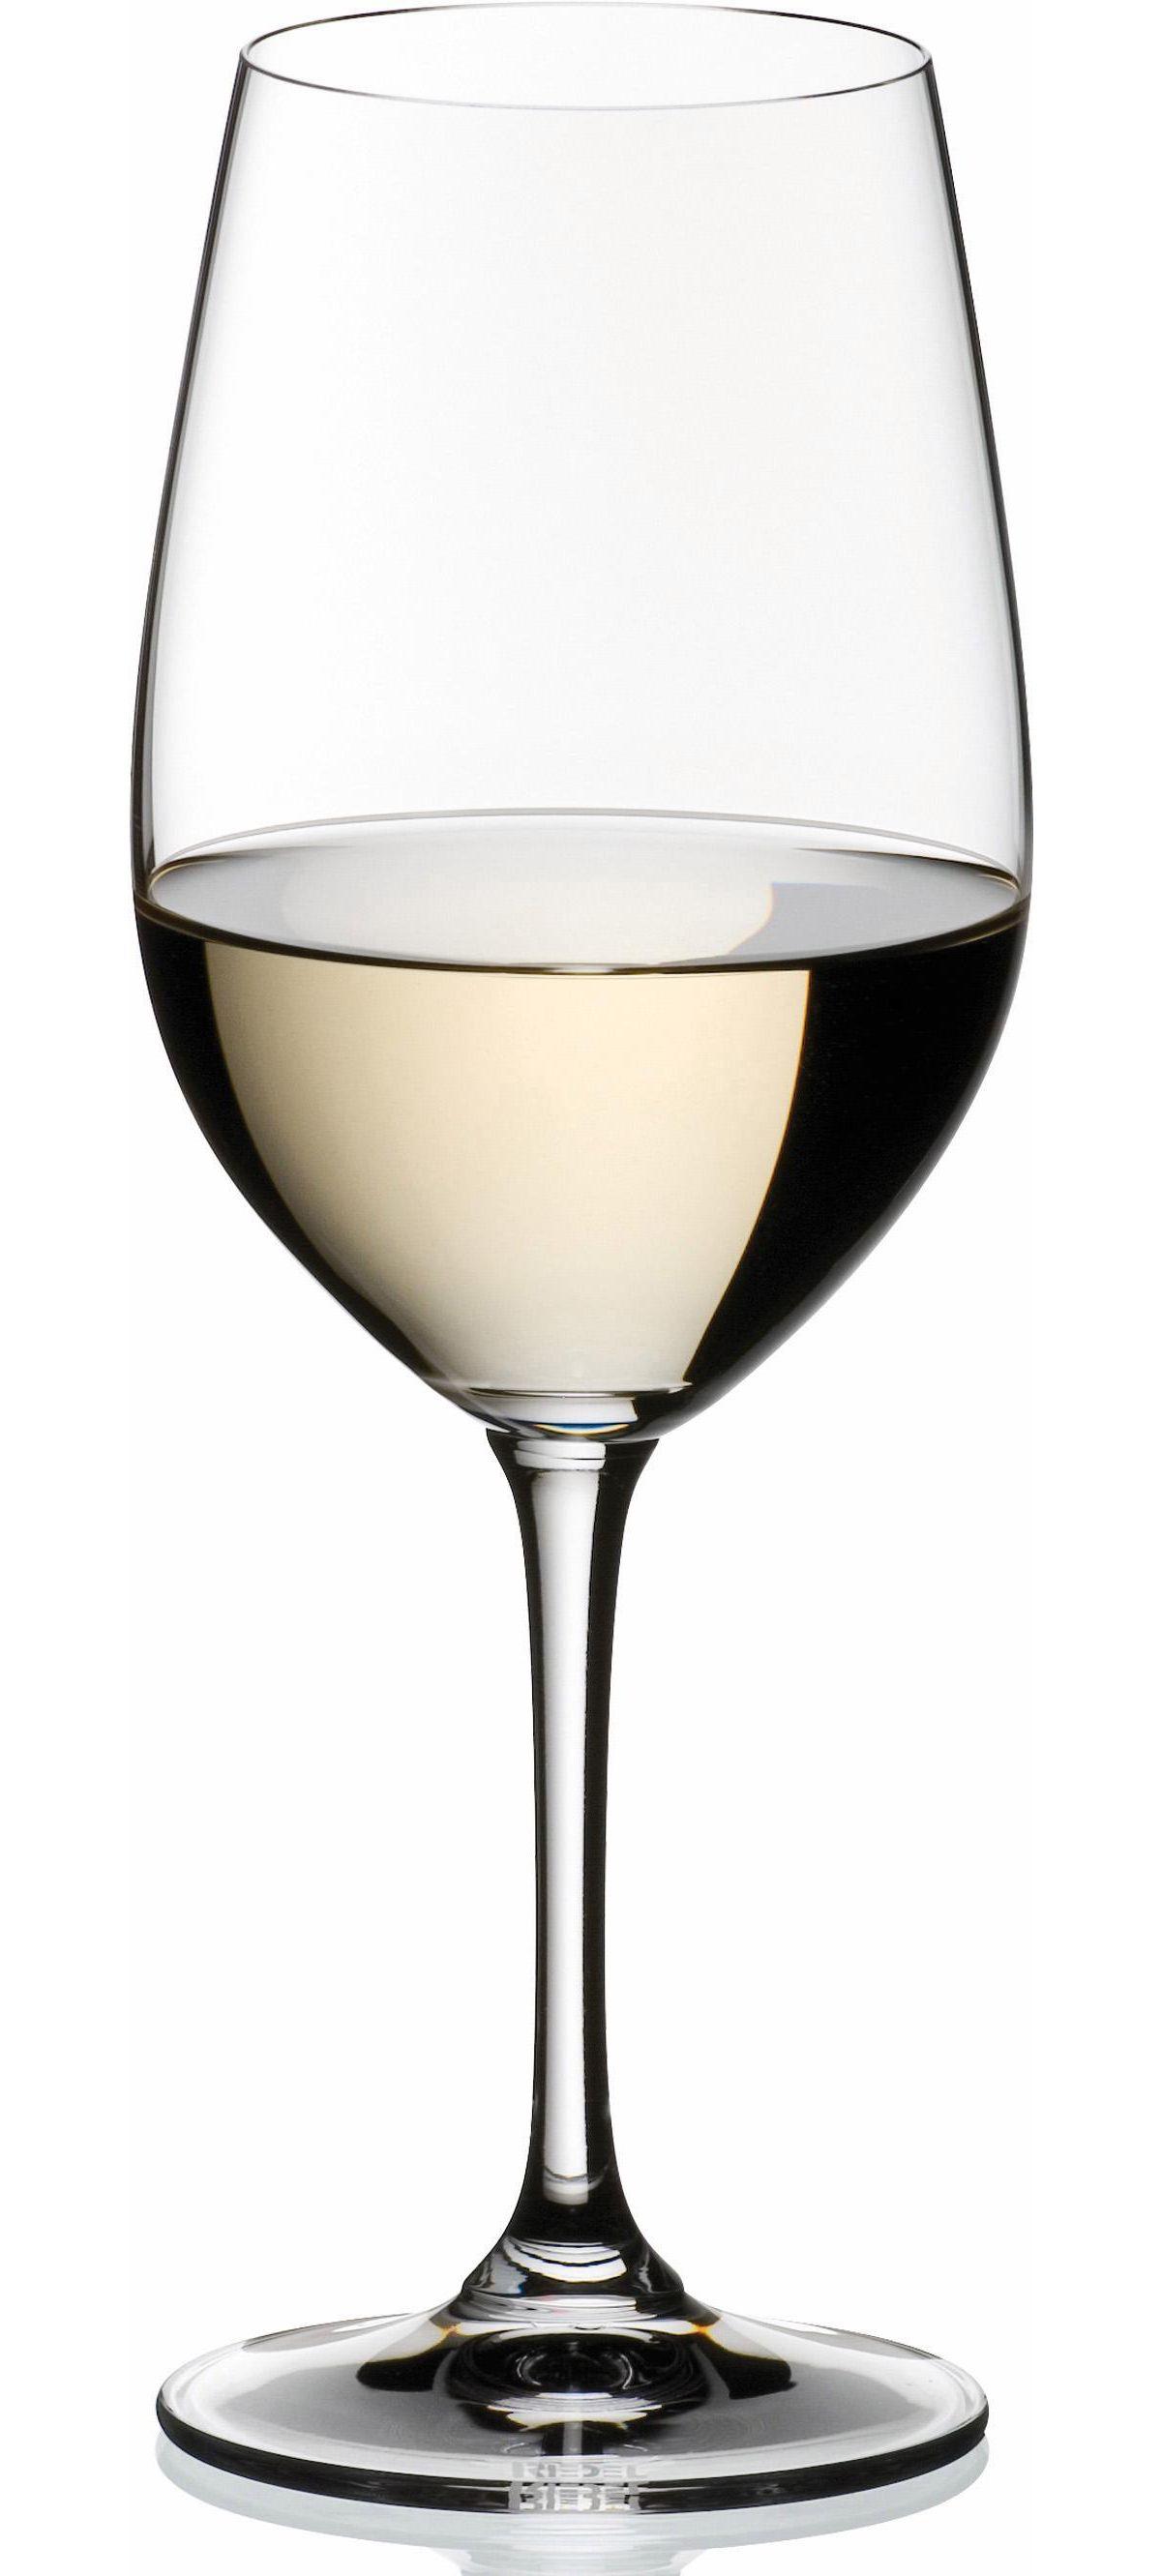 RIEDEL GLASS Wein-Glas, Zinfandel/Riesling Gran...